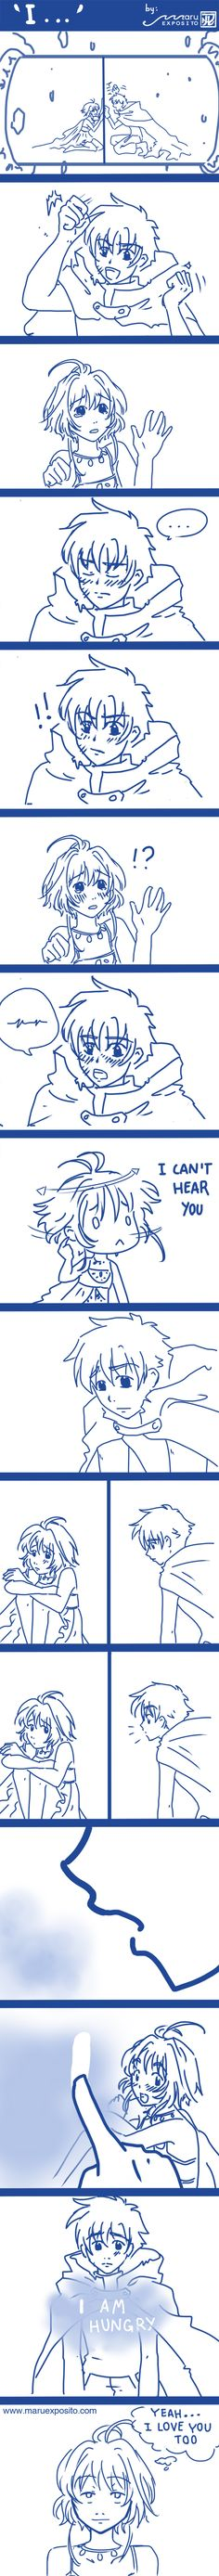 I... -TRC Comic by YuukinoTsuna.deviantart.com on @deviantART sakura syaoran comic shaoran xiaolang tsubasa reservoir chronicle fanart doujinshi CLAMP #maruexposito #yuukinotsuna